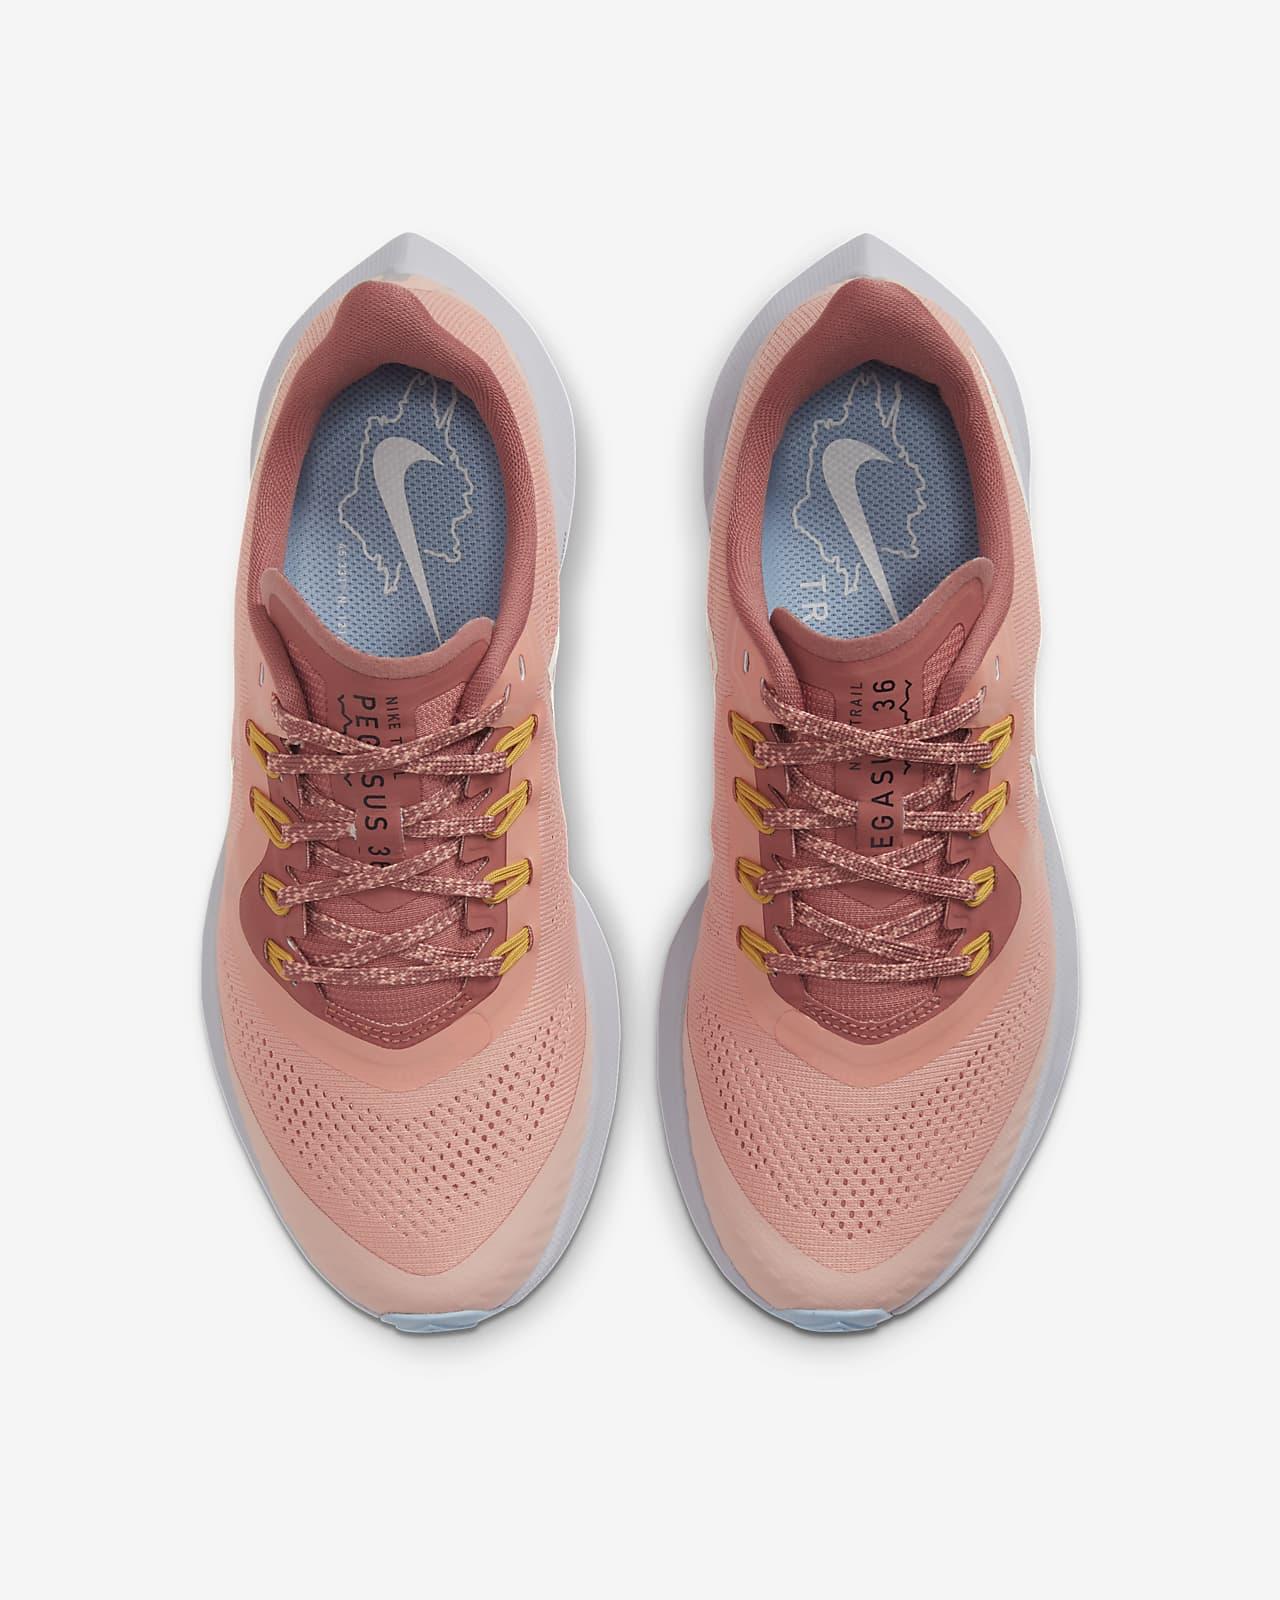 black cap toe shoes Hot Sale Nike Men s Zoom Freak 1 Basketball Shoes Hyper Royal